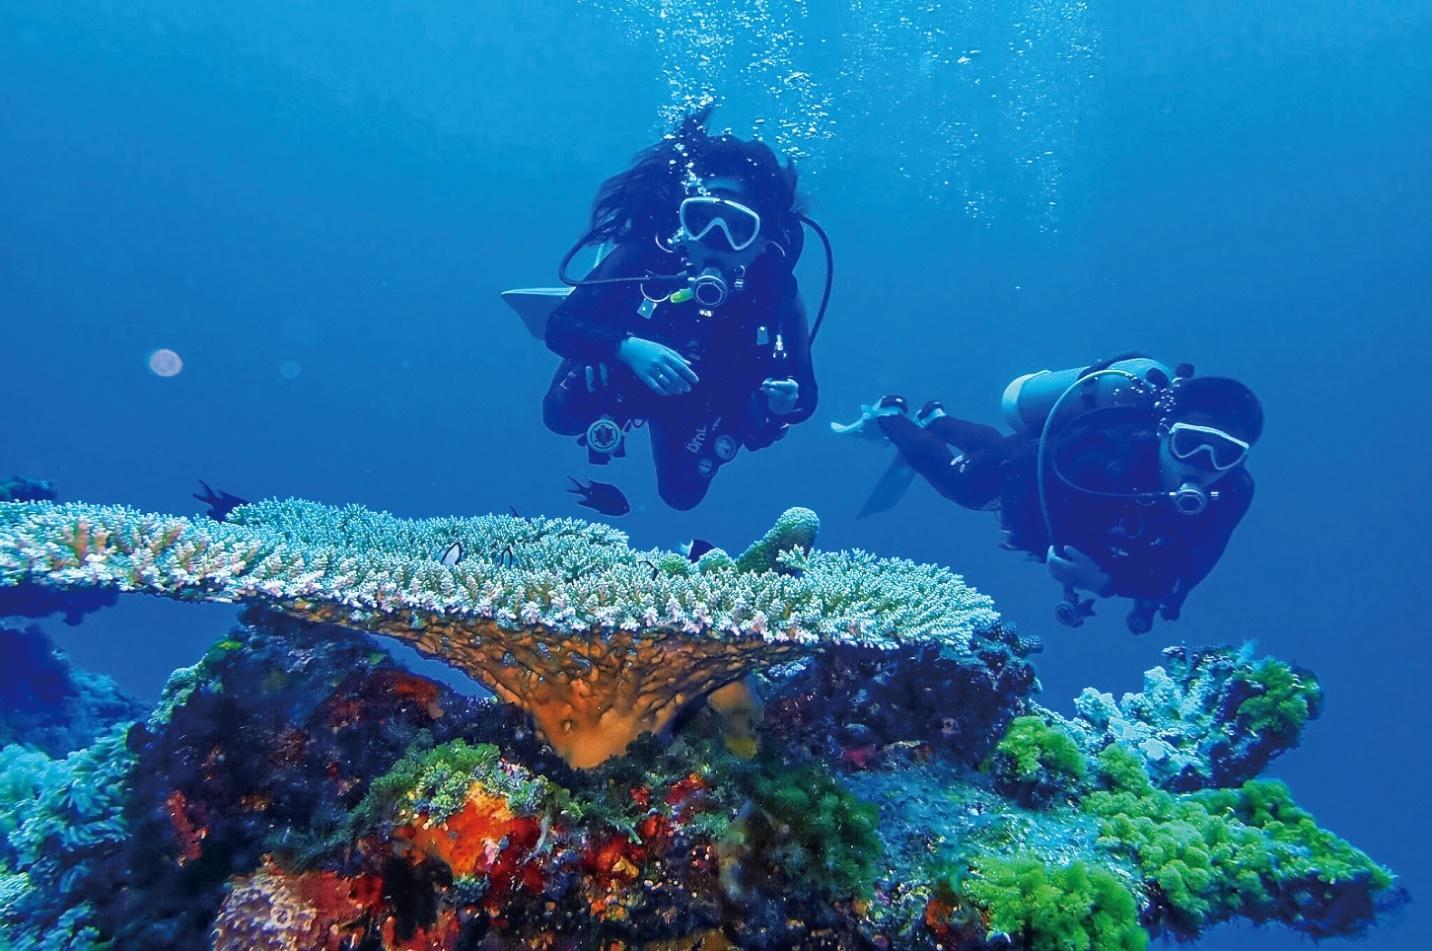 taiwan tourism malaysia